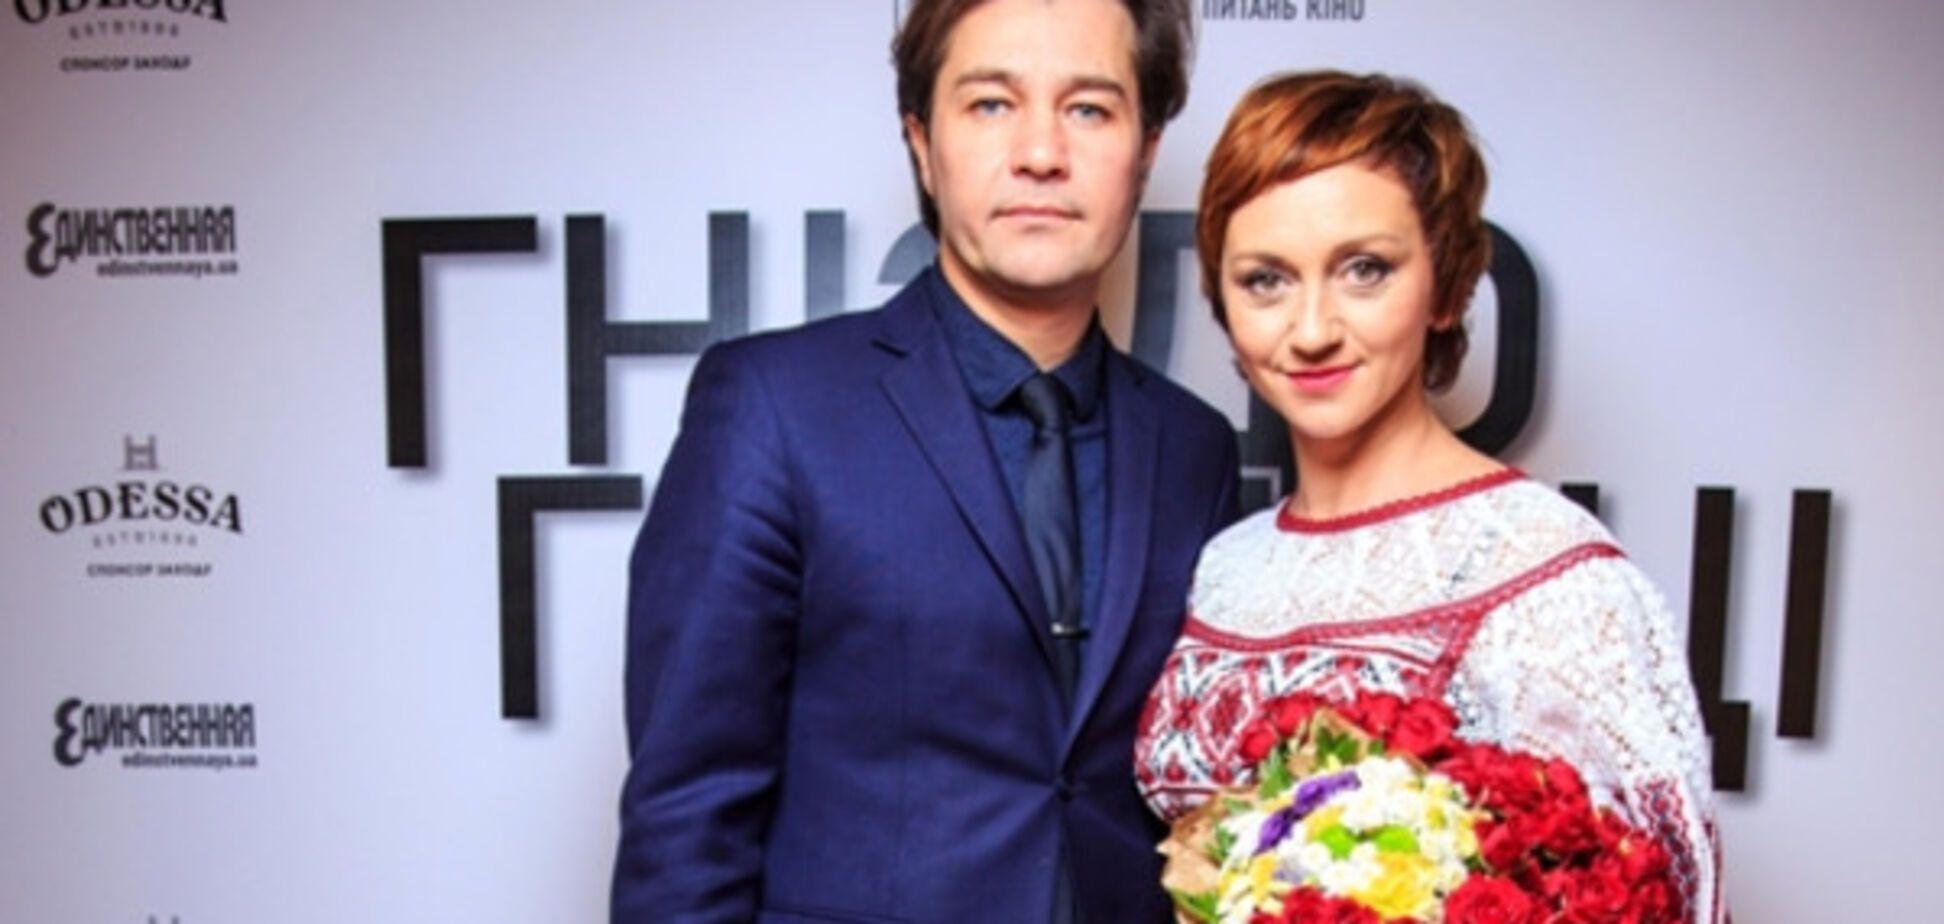 Евгений Нищук и Римма Зюбина